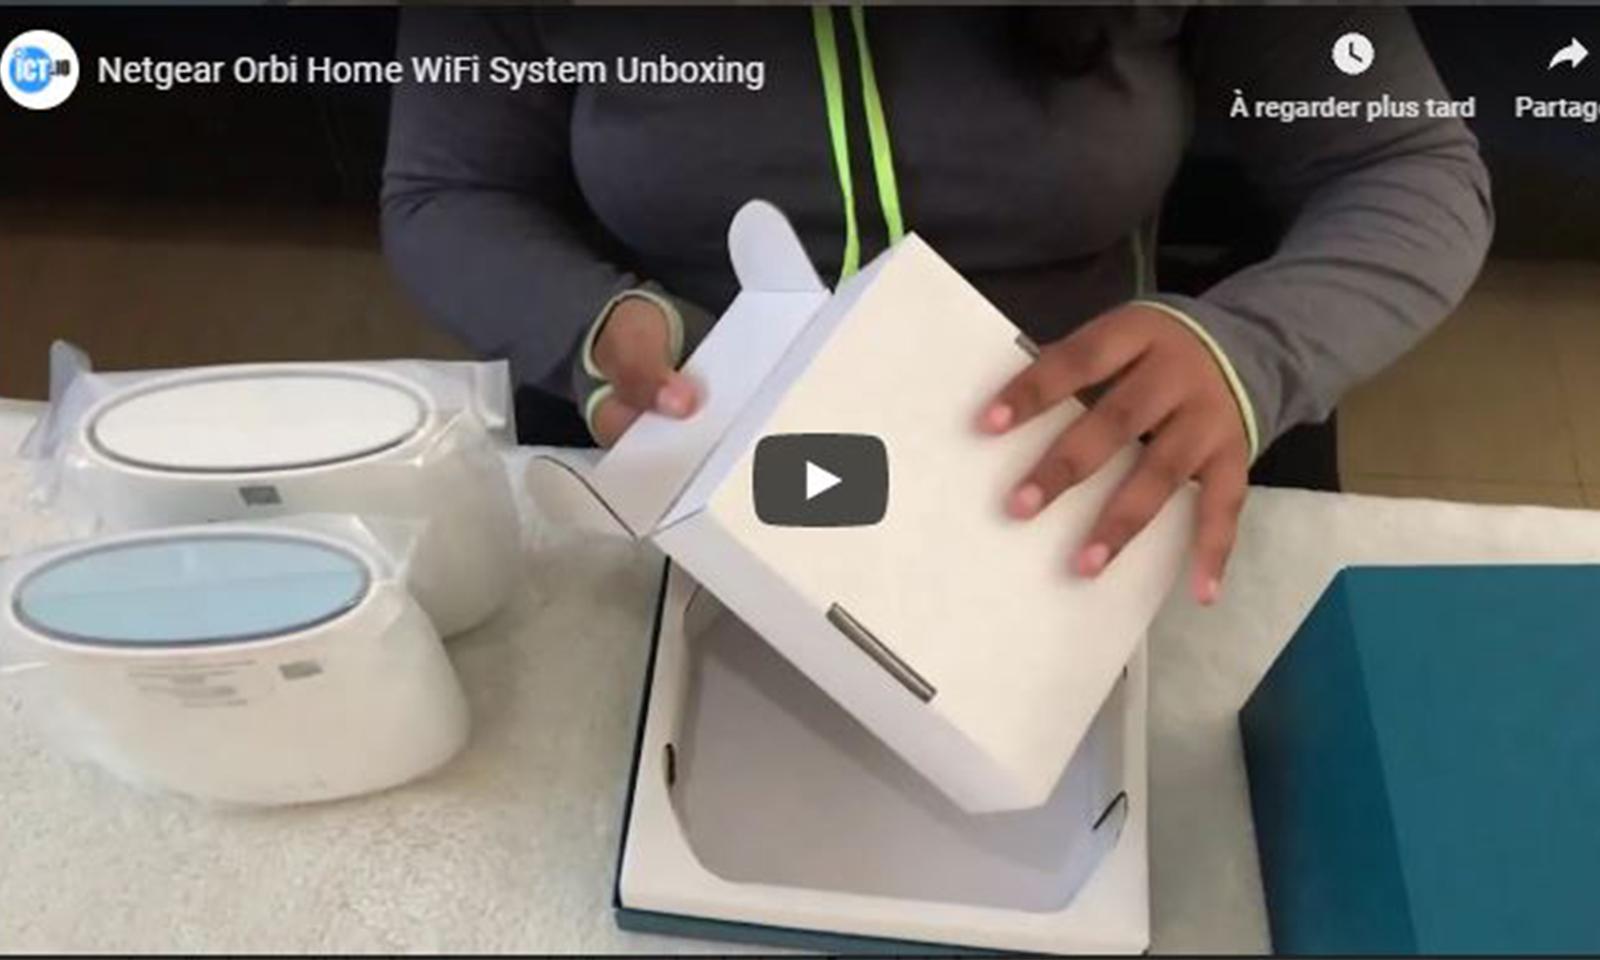 Netgear Orbi Home WiFi System Unboxing